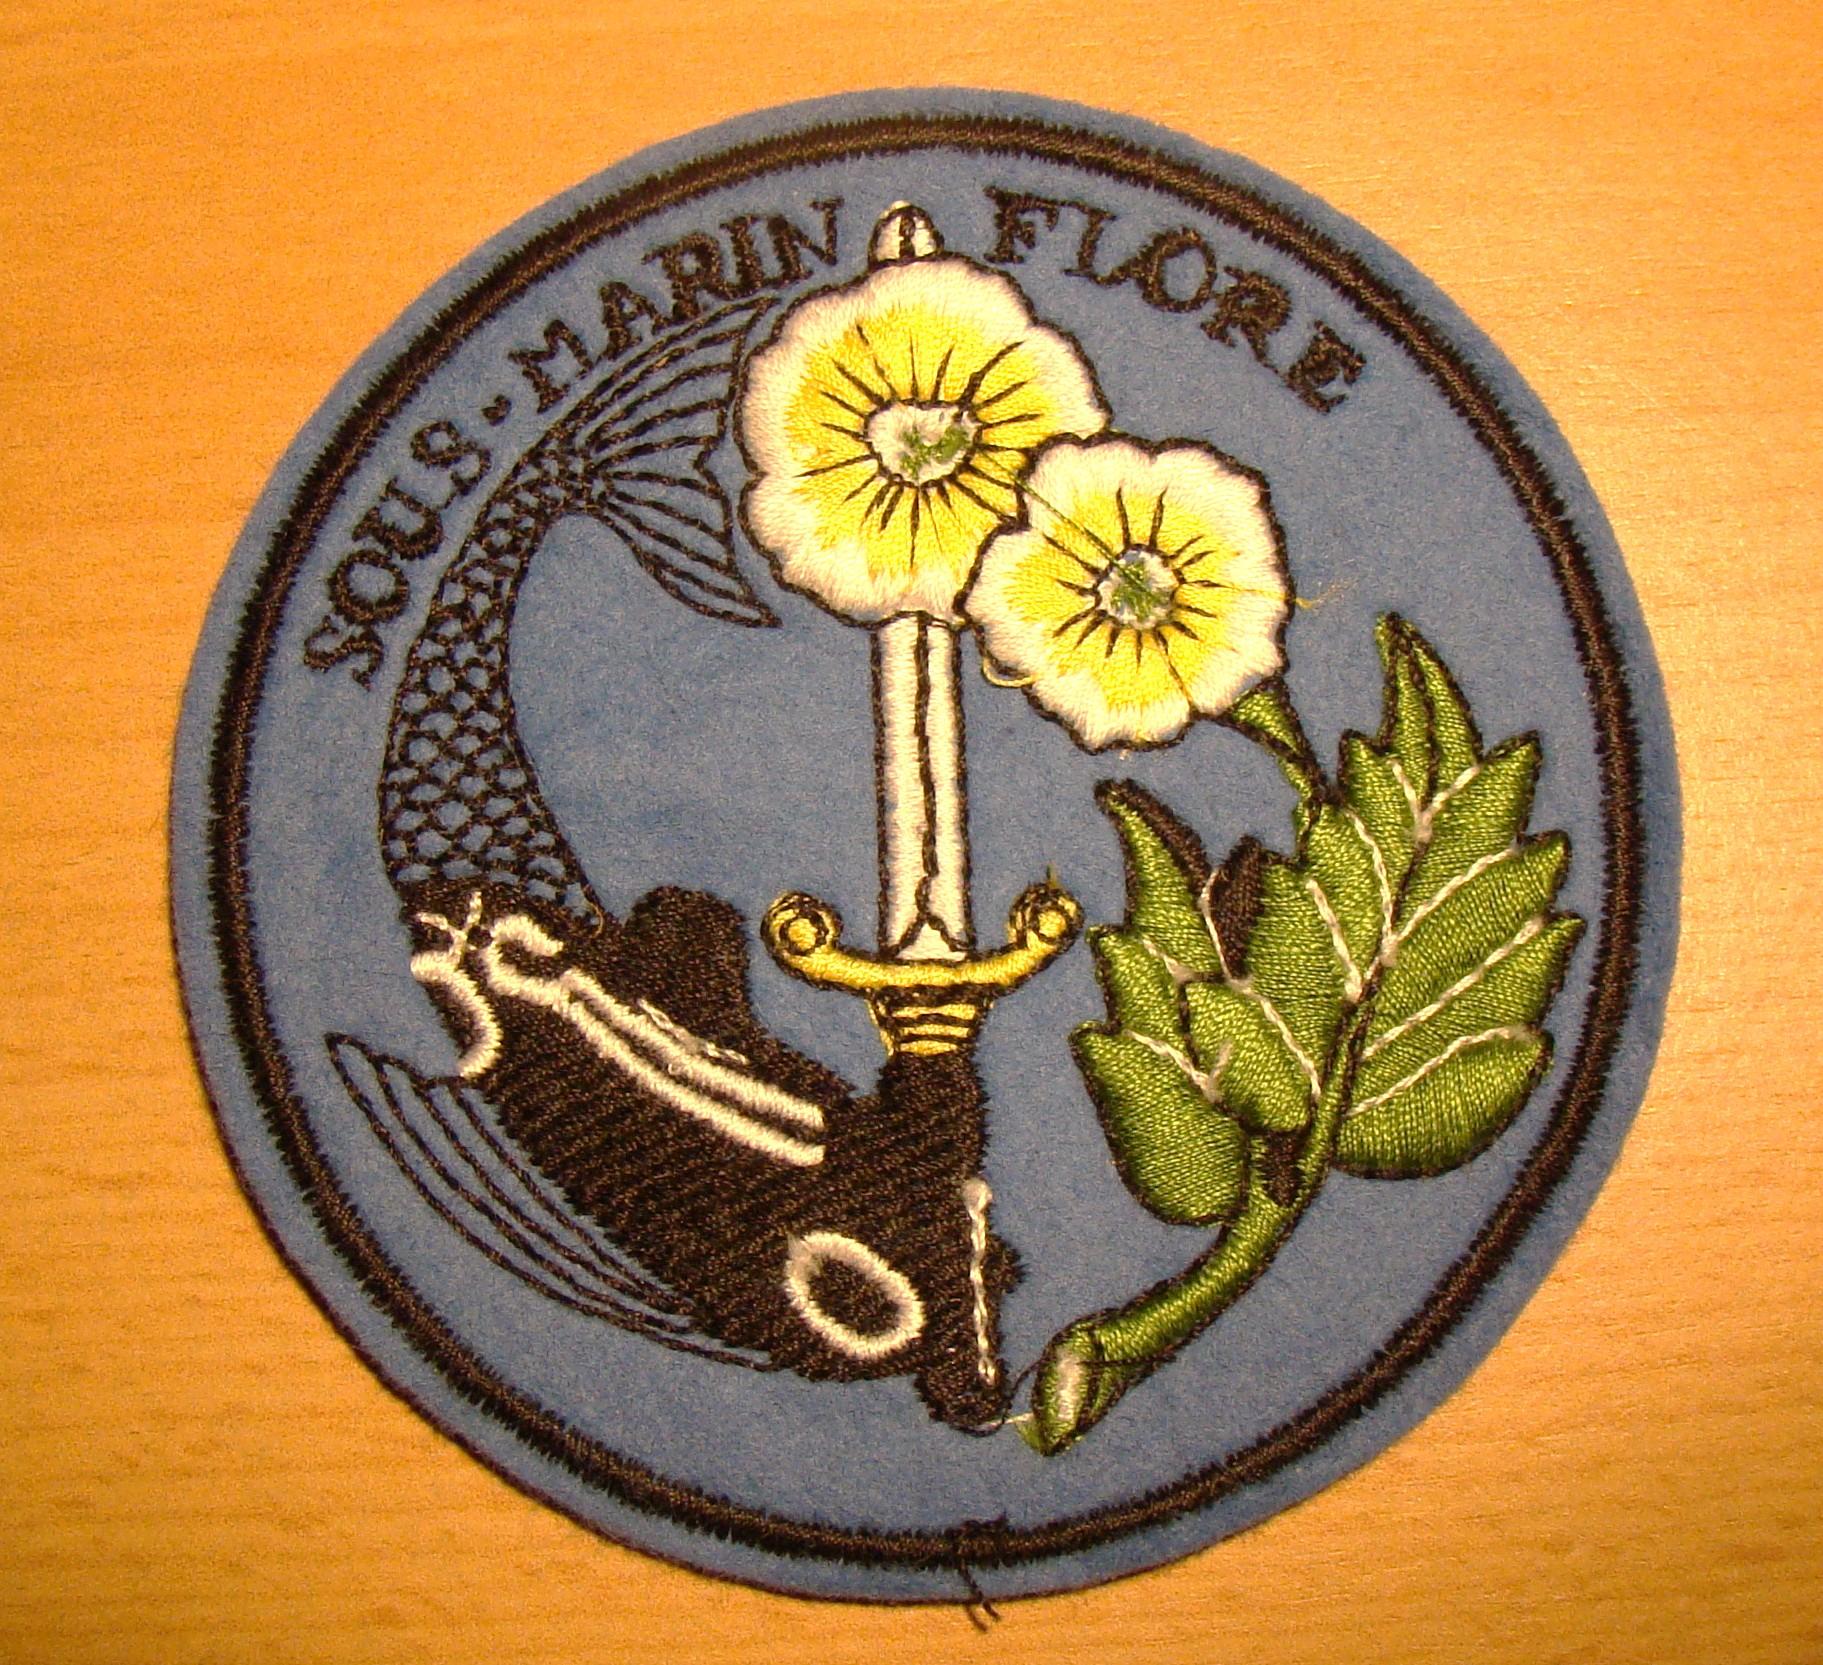 [Logos, Tapes, Insignes] Ecussons sous-marins - Page 2 648198DSC03874